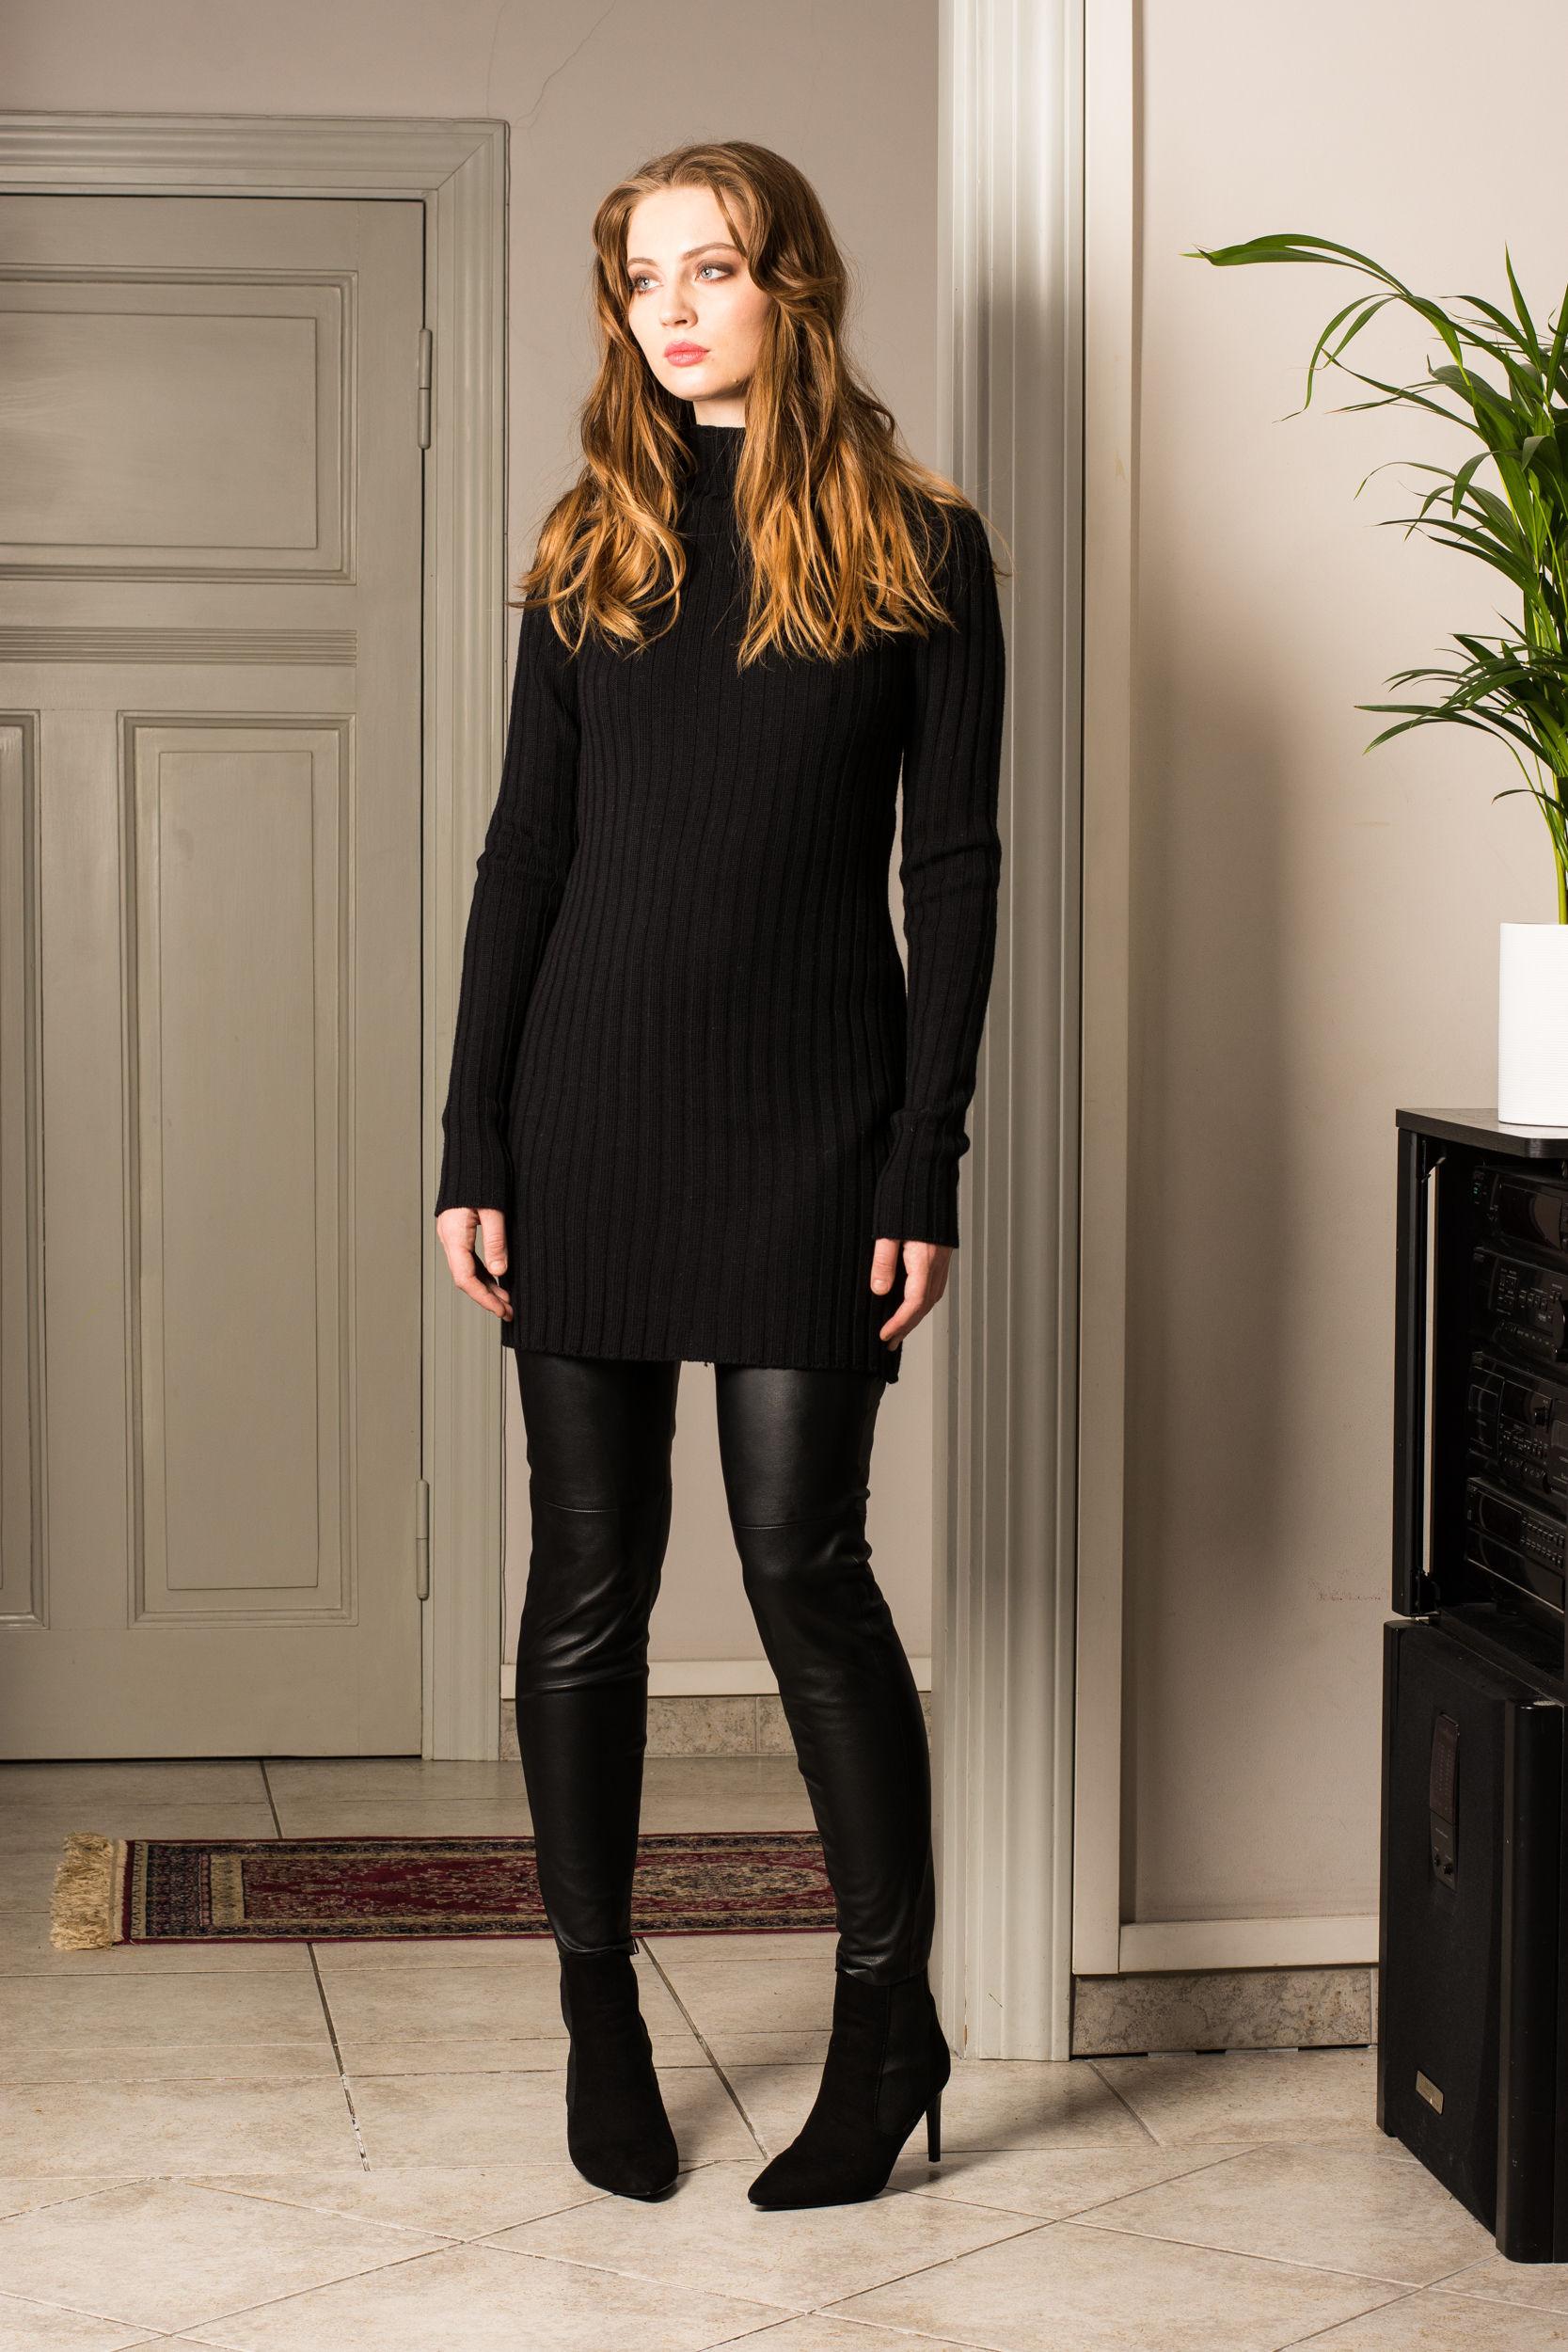 Black merino ribbed womens sweater jumper DUFFY